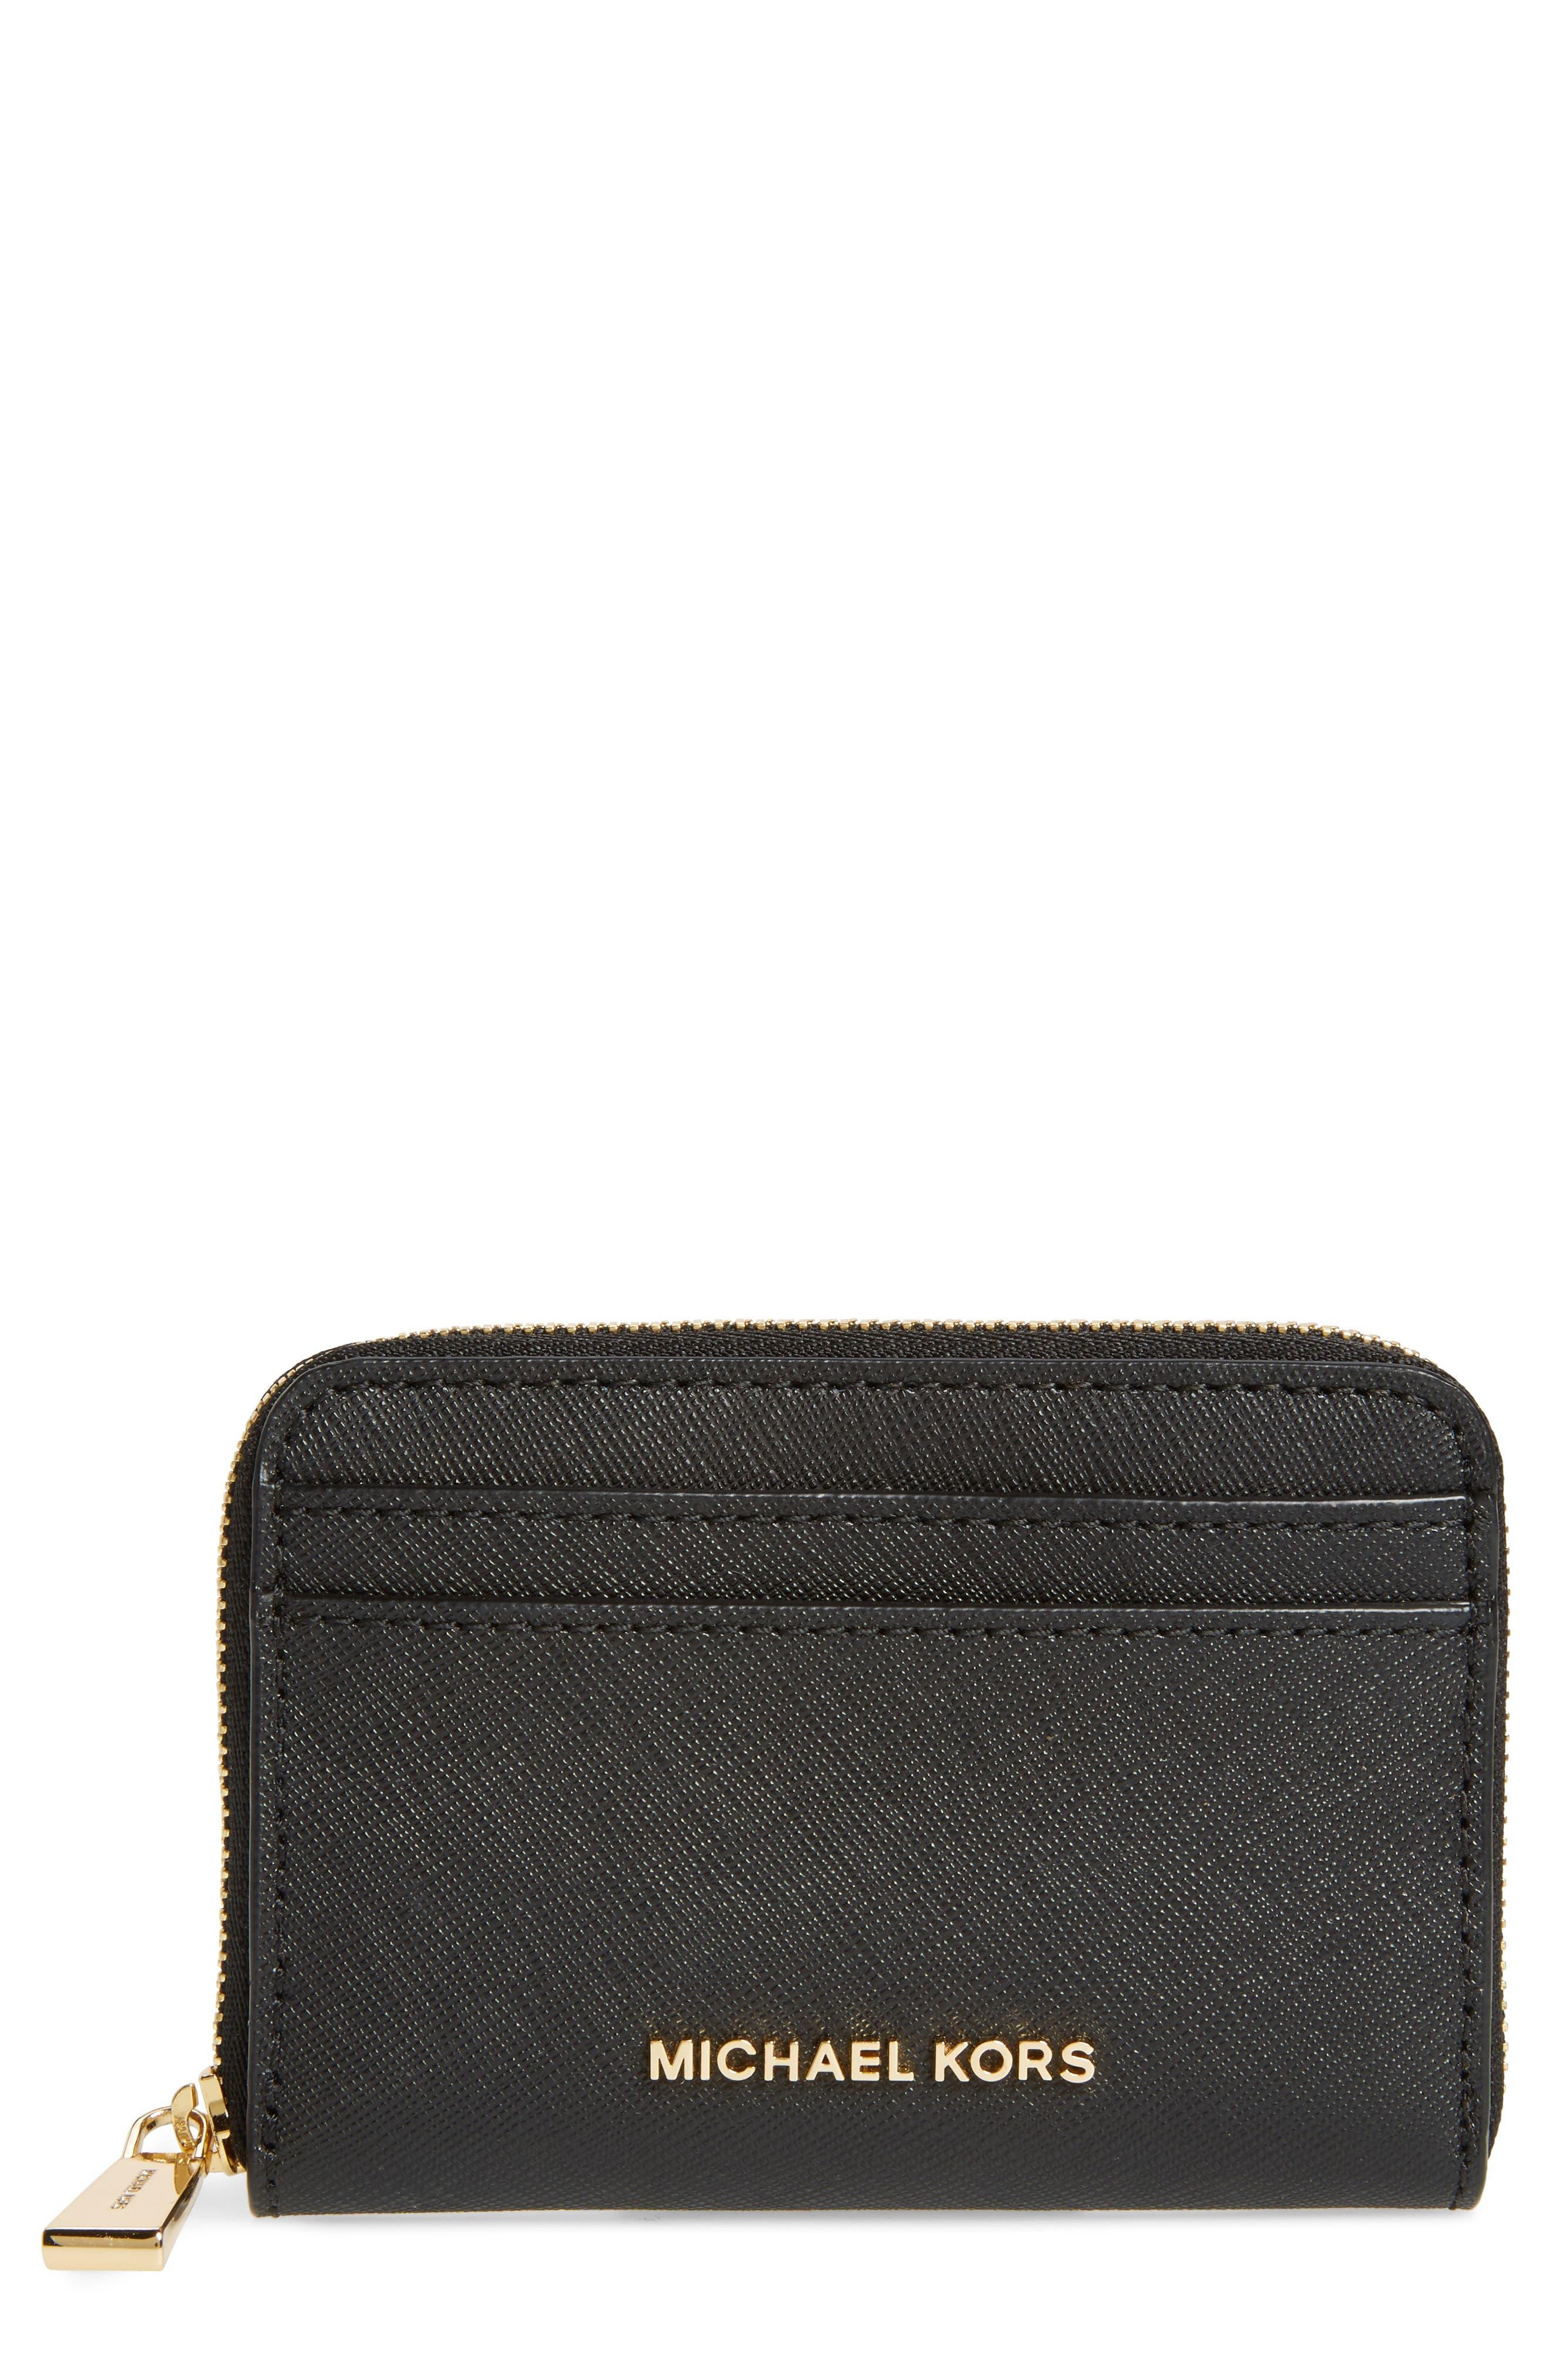 Za Card Holder,                             Main thumbnail 1, color,                             Black